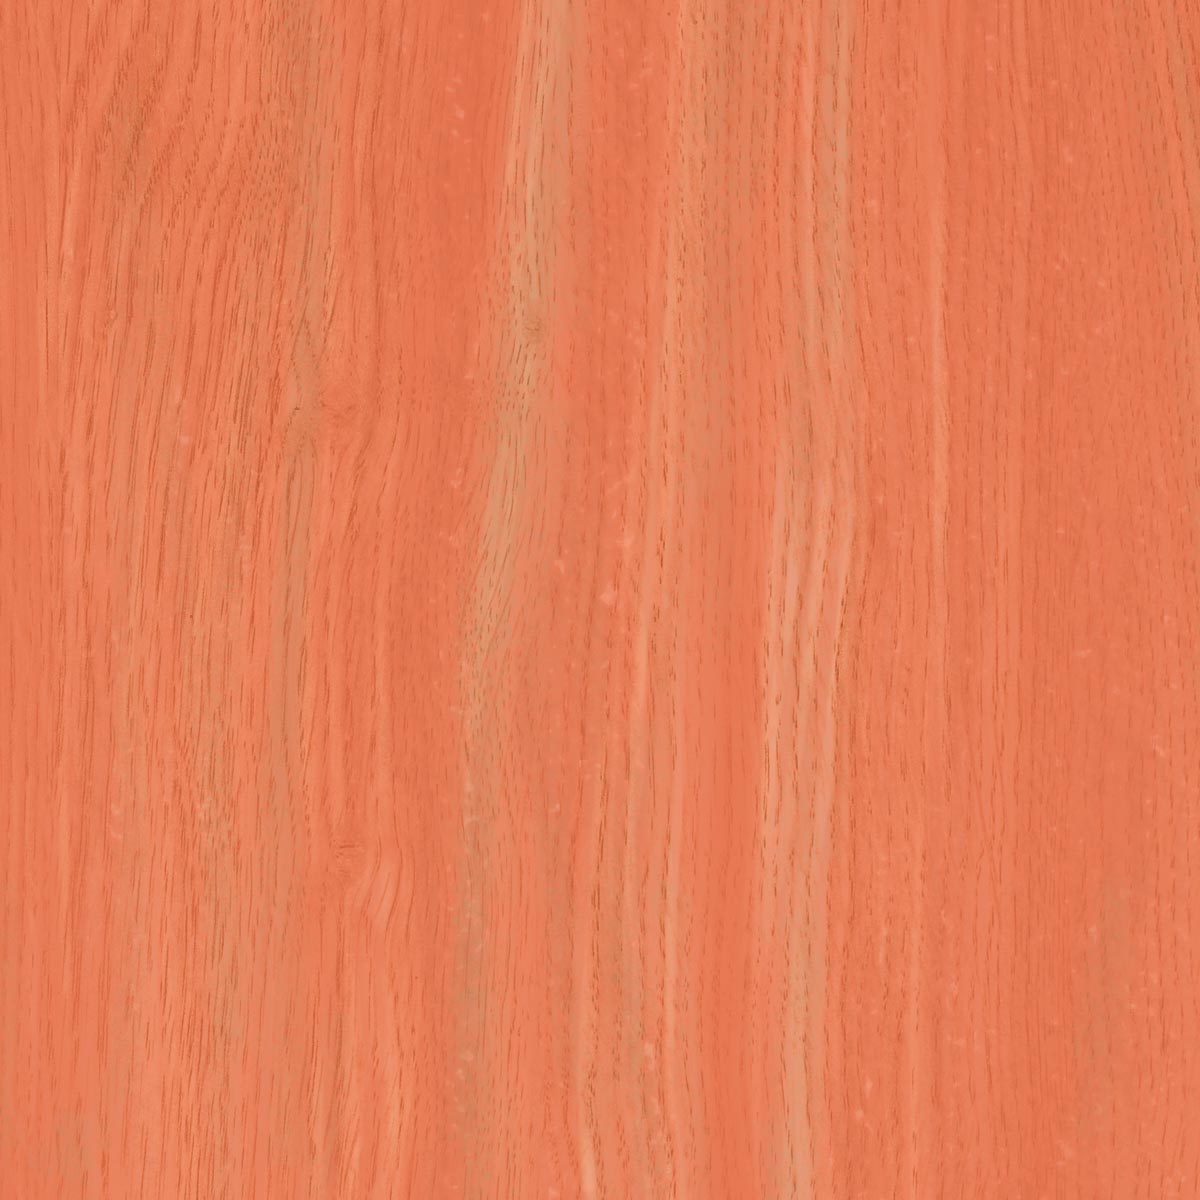 FolkArt ® Pickling Wash™ - Coral Beauty, 2 oz. - 5827